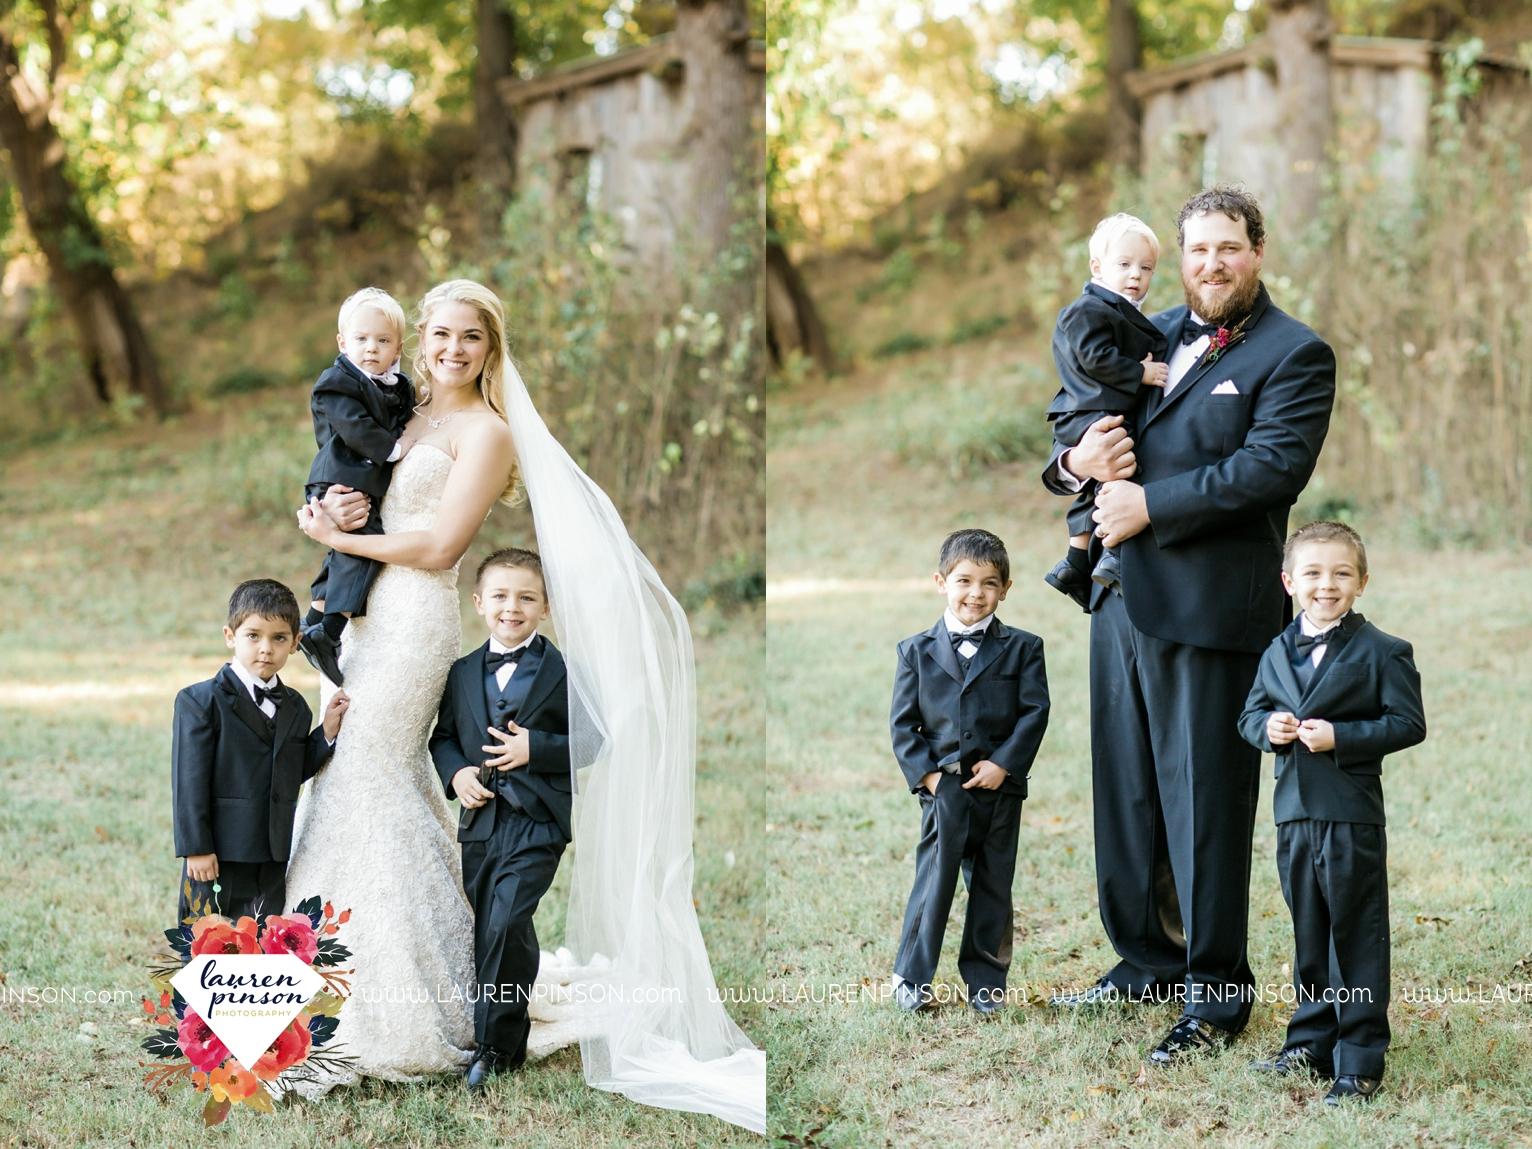 rustic-wichita-falls-texas-wedding-photographer-gold-glam-mayfield-events-market-street-united-allue-bridals-fall_1733.jpg